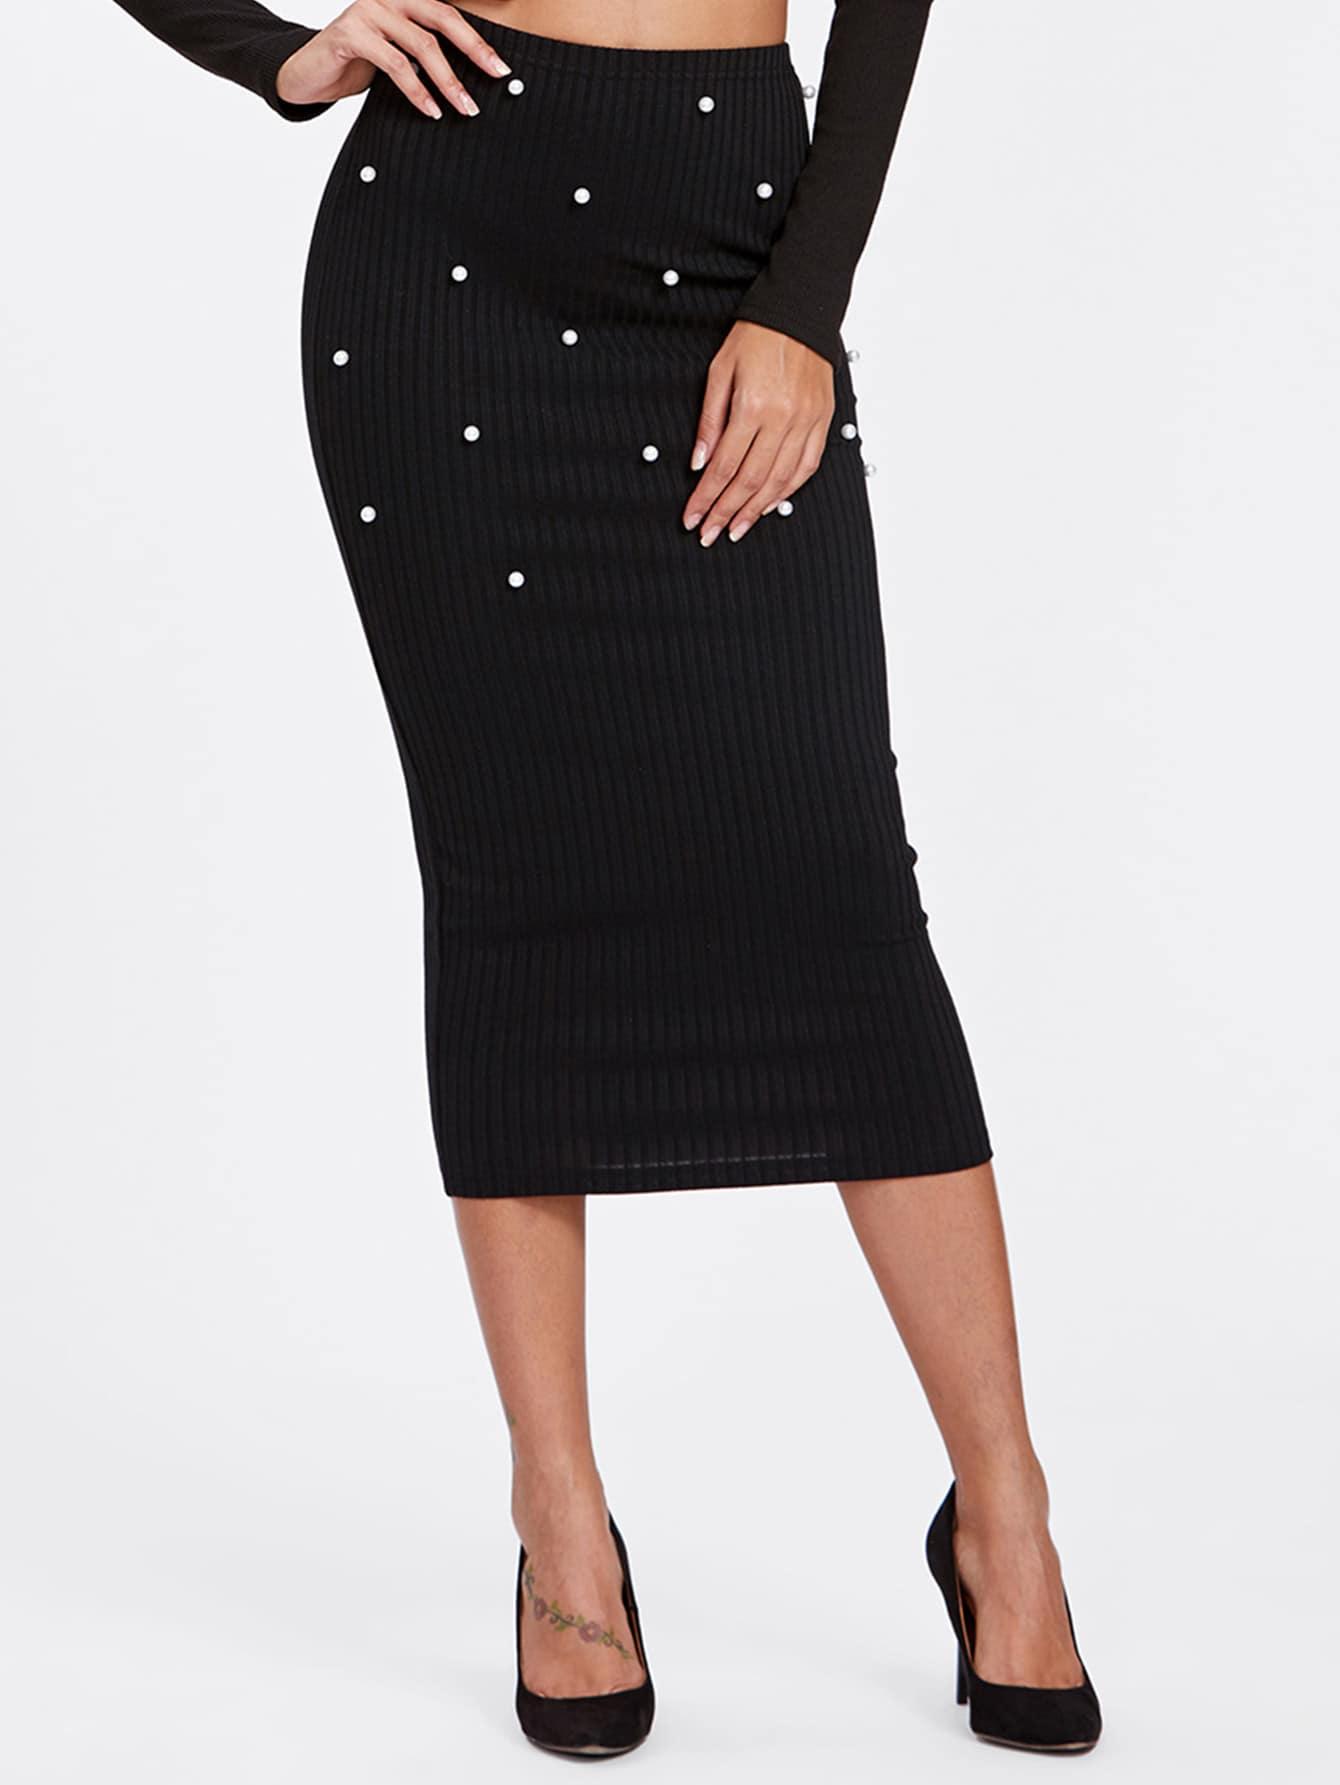 Pearl Beading Rib Knit Fitted Skirt skirt170930702